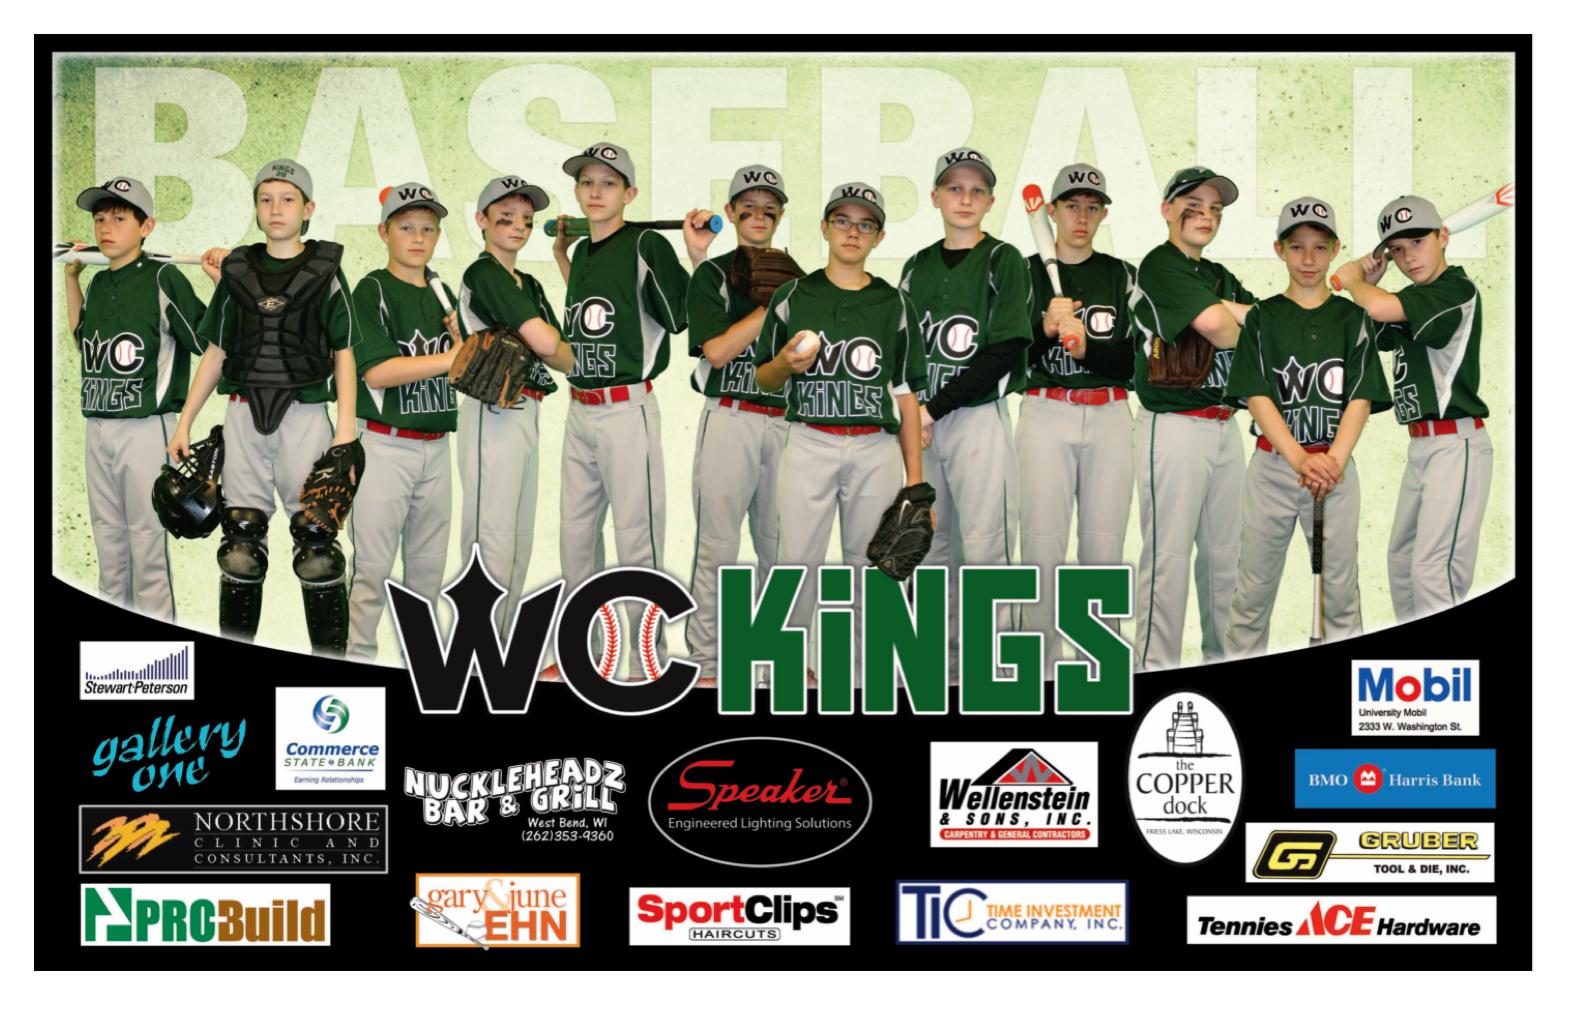 WC Kings banner